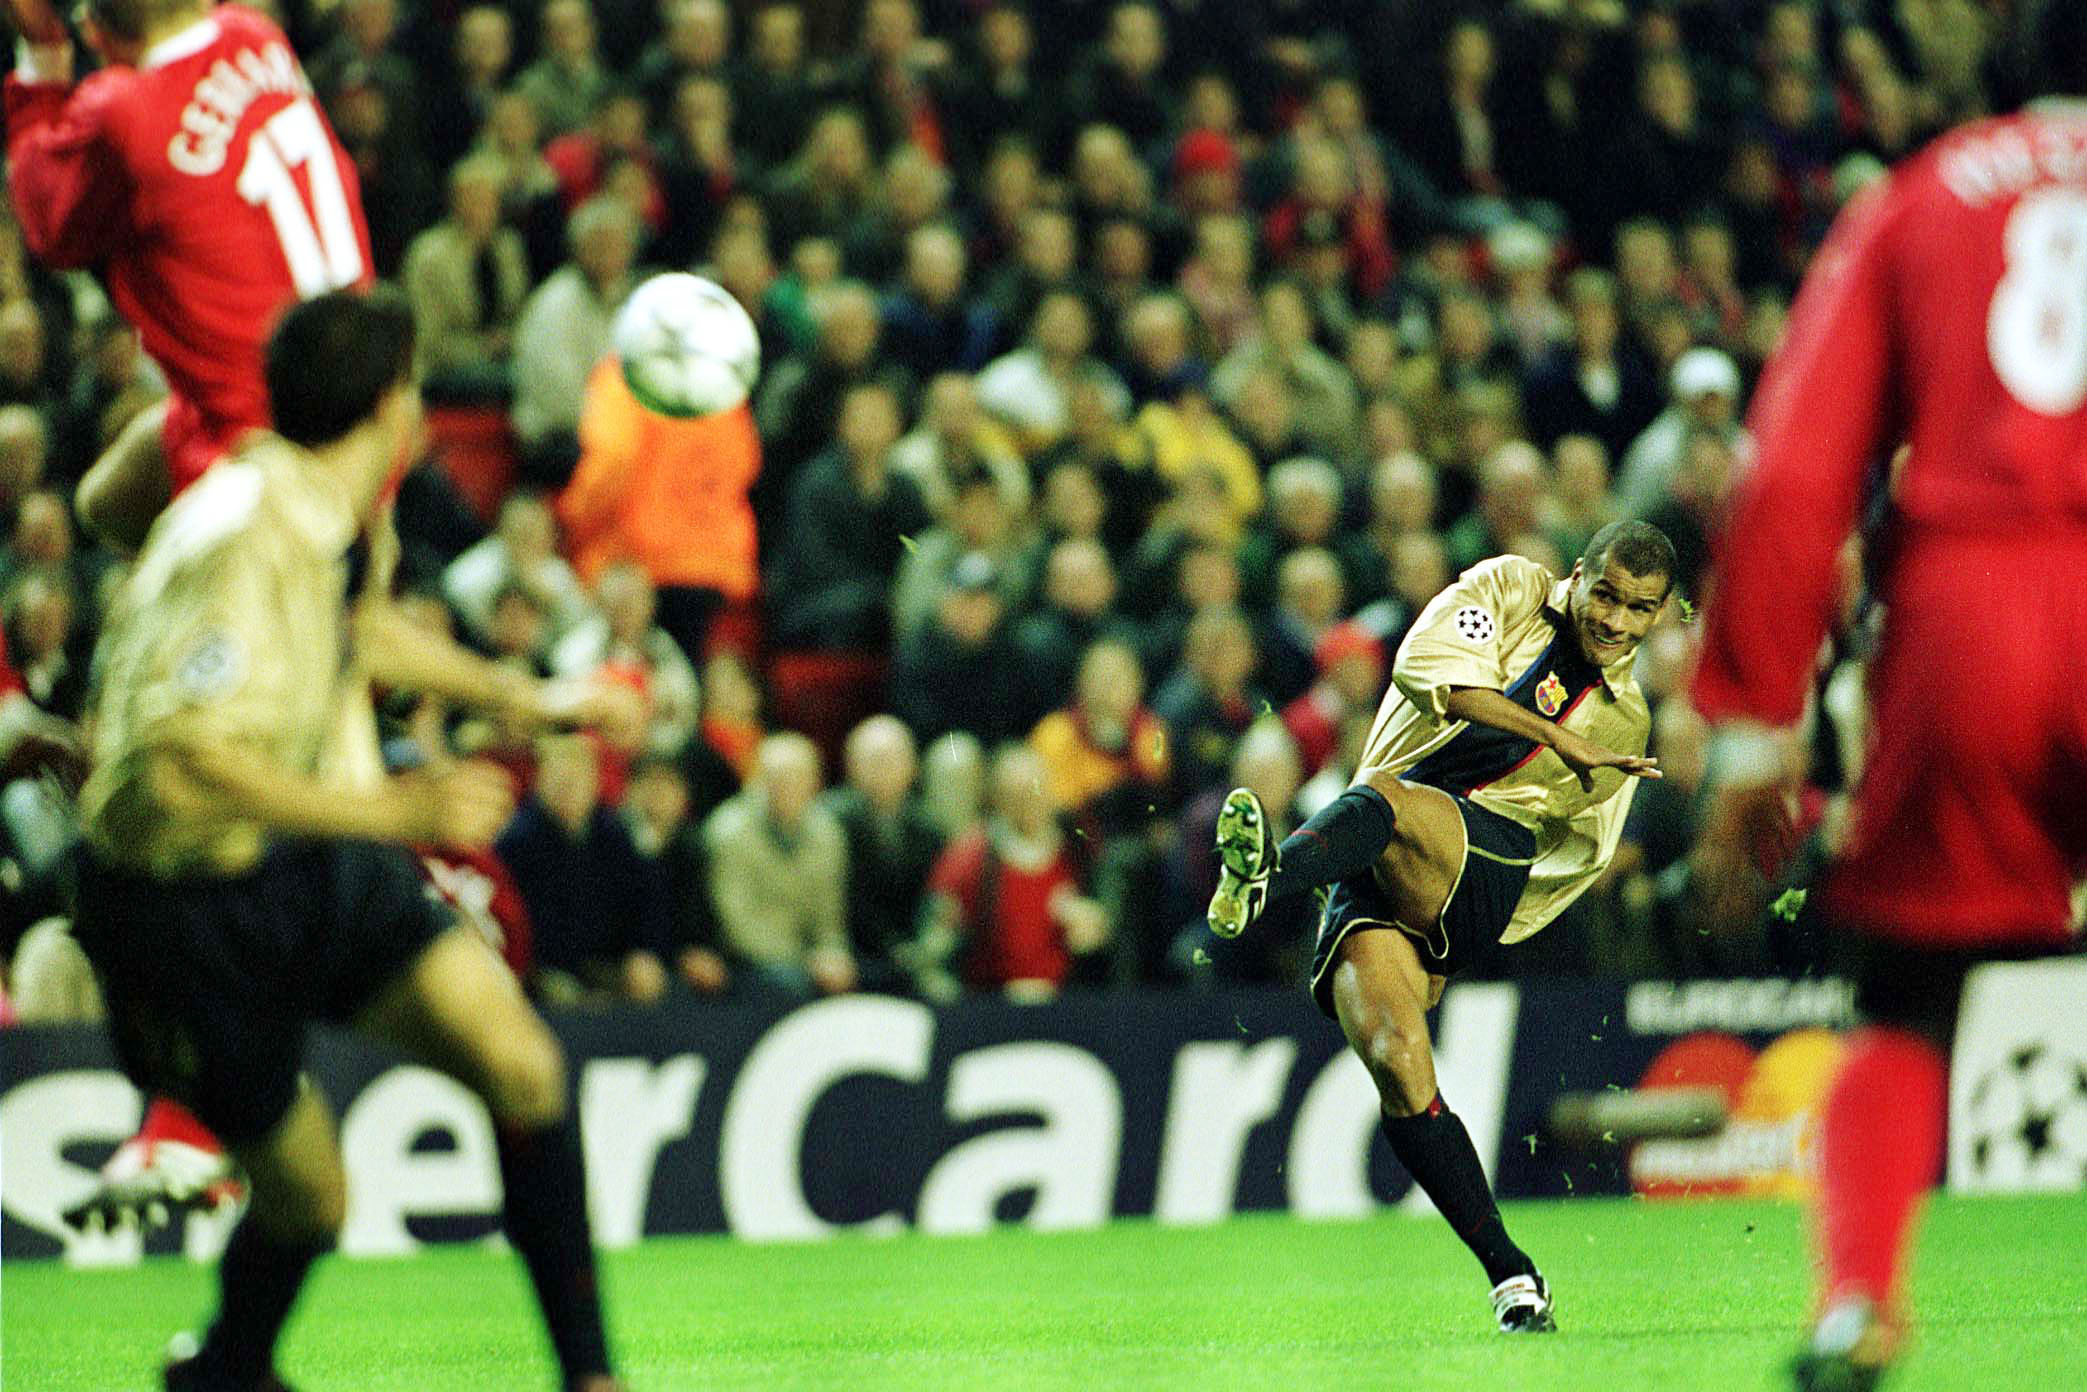 Bernardo Silva Determined to Win Premier League to Amend Champions League Heartbreak